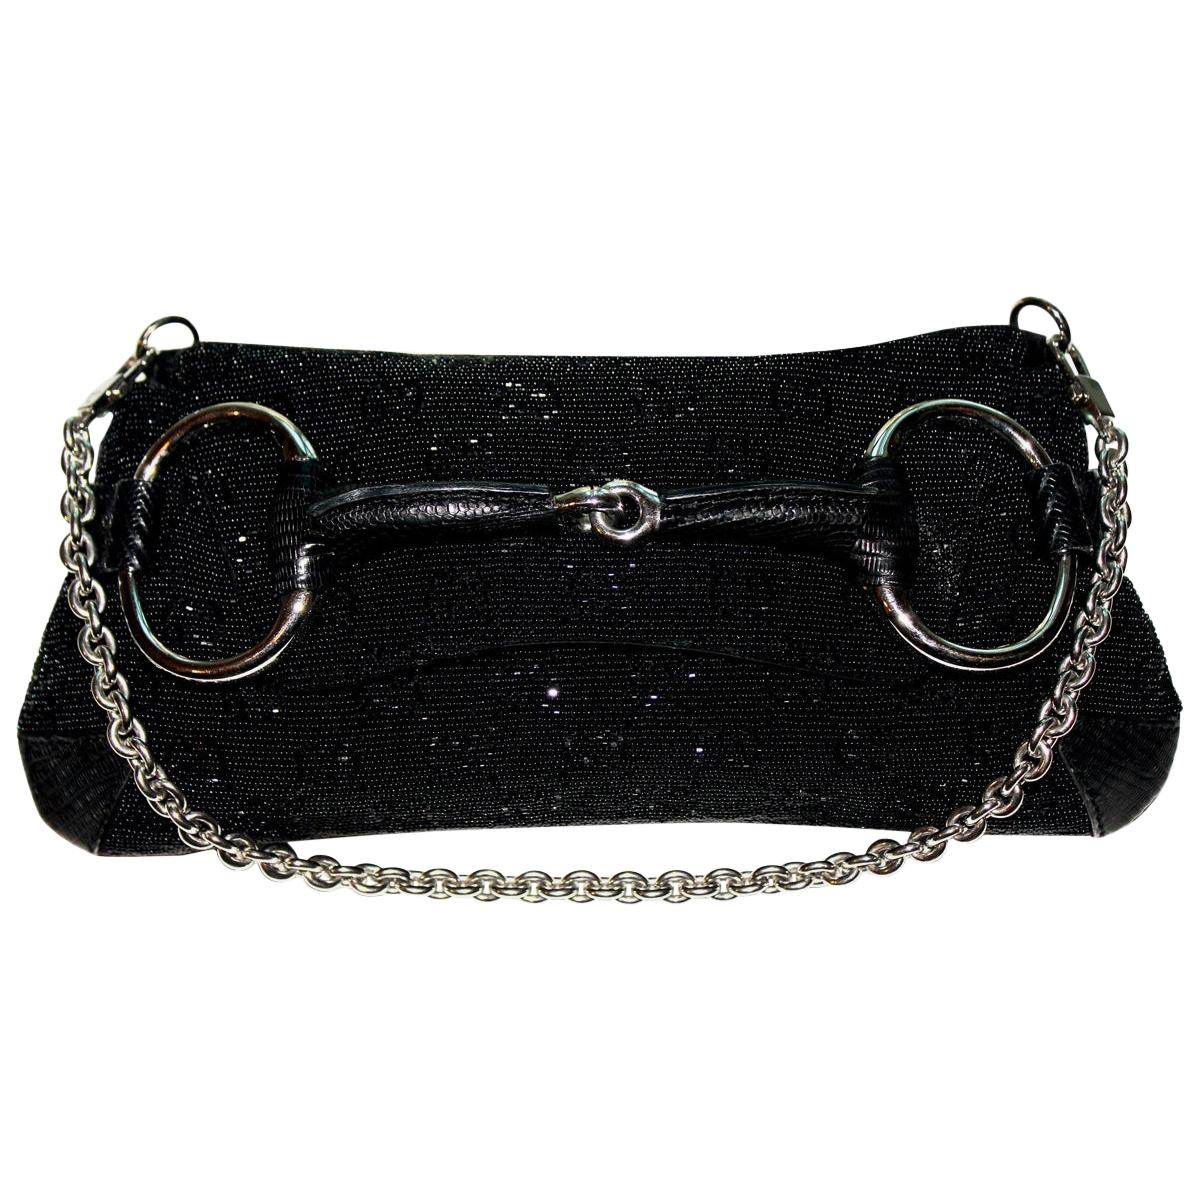 Gorgeous Black Gucci GG Monogram Beaded Crystal Exotic Skin Horsebit Bag Clutch